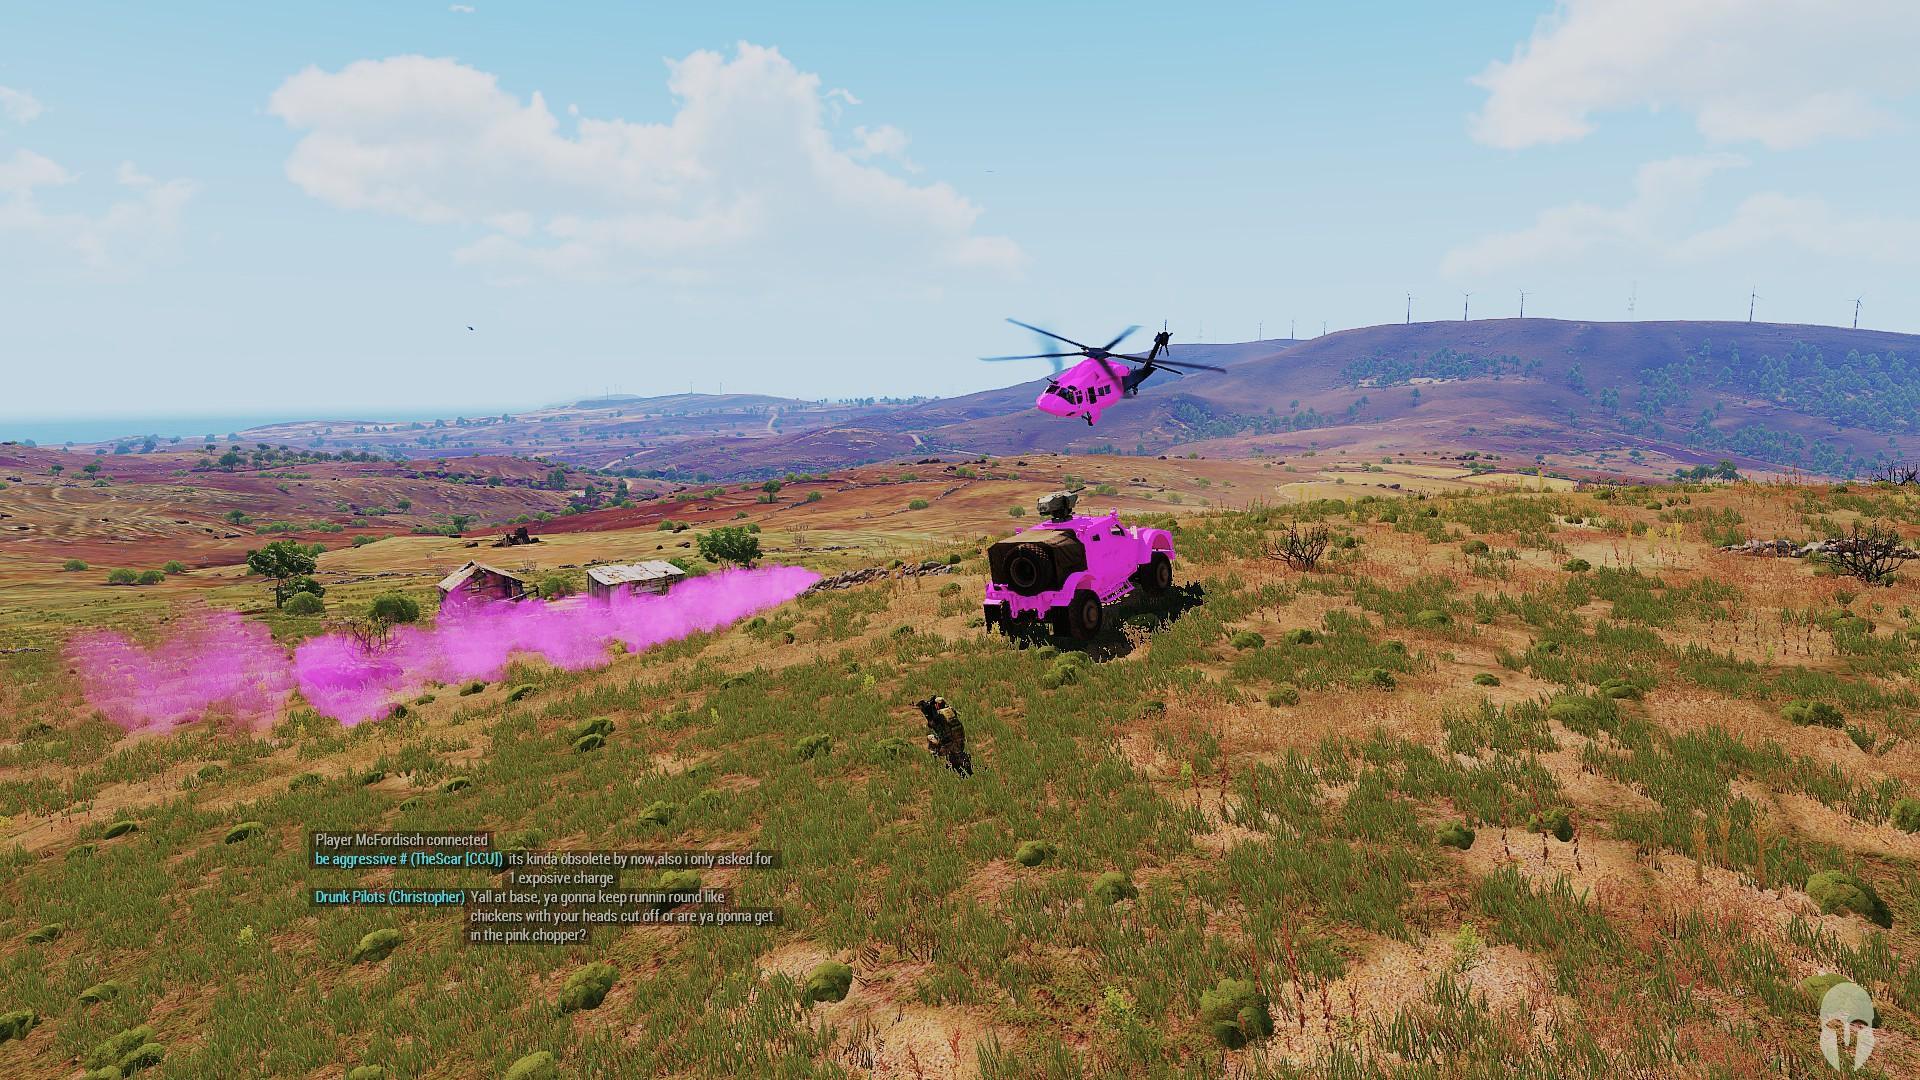 Pink Ghosthawk landing at Pink smoke alongside a Pink Hunter